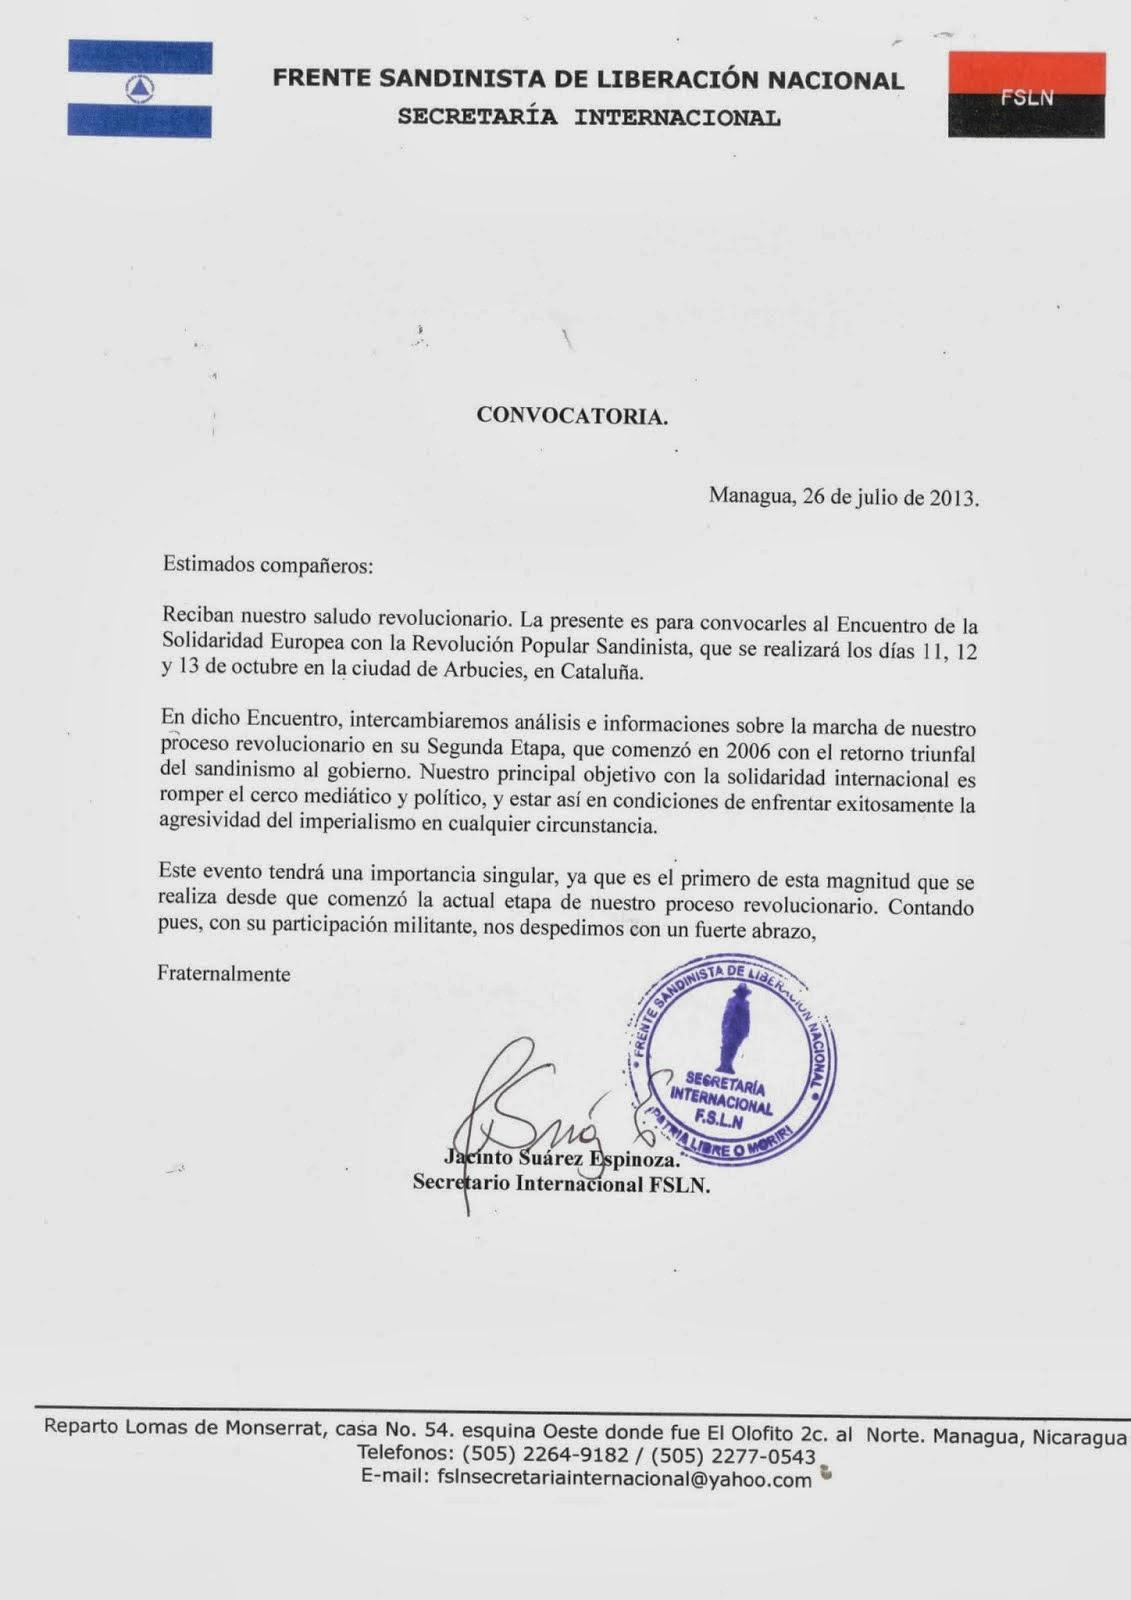 Component K2 Item 216 Premio Nacional A La Defensa De Los Derechos Humanos >> D I F U S I O N R E B E L D E Septiembre 2013